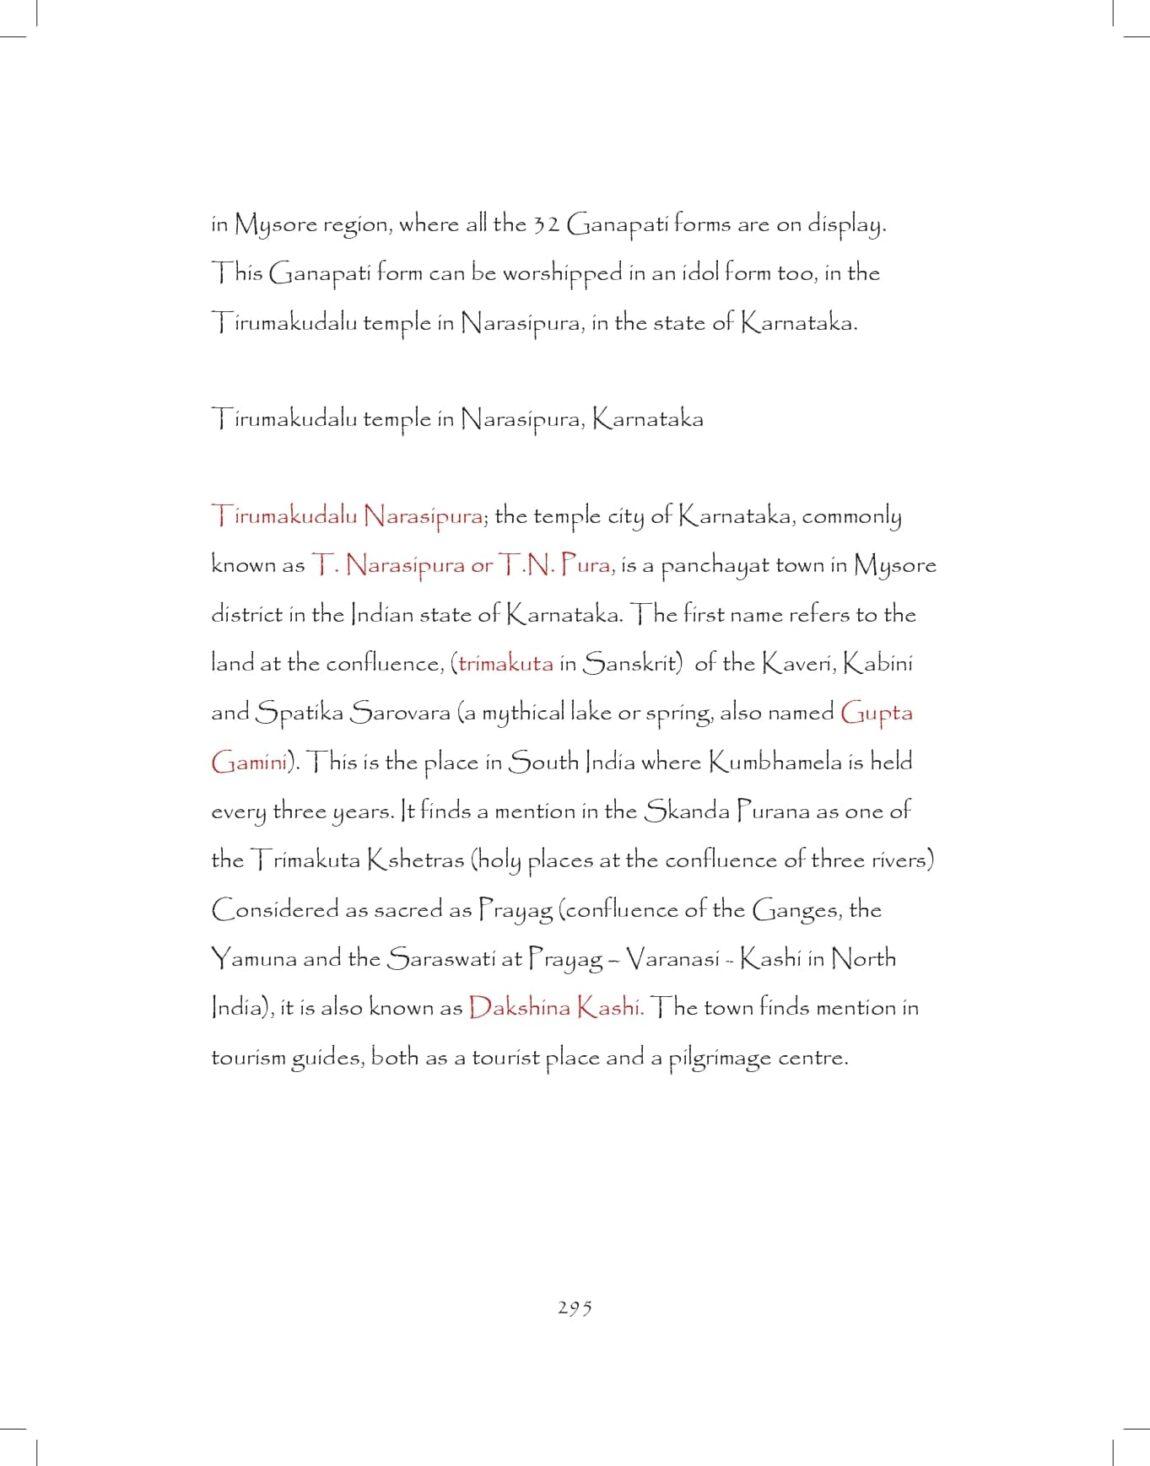 Ganesh-print_pages-to-jpg-0295.jpg